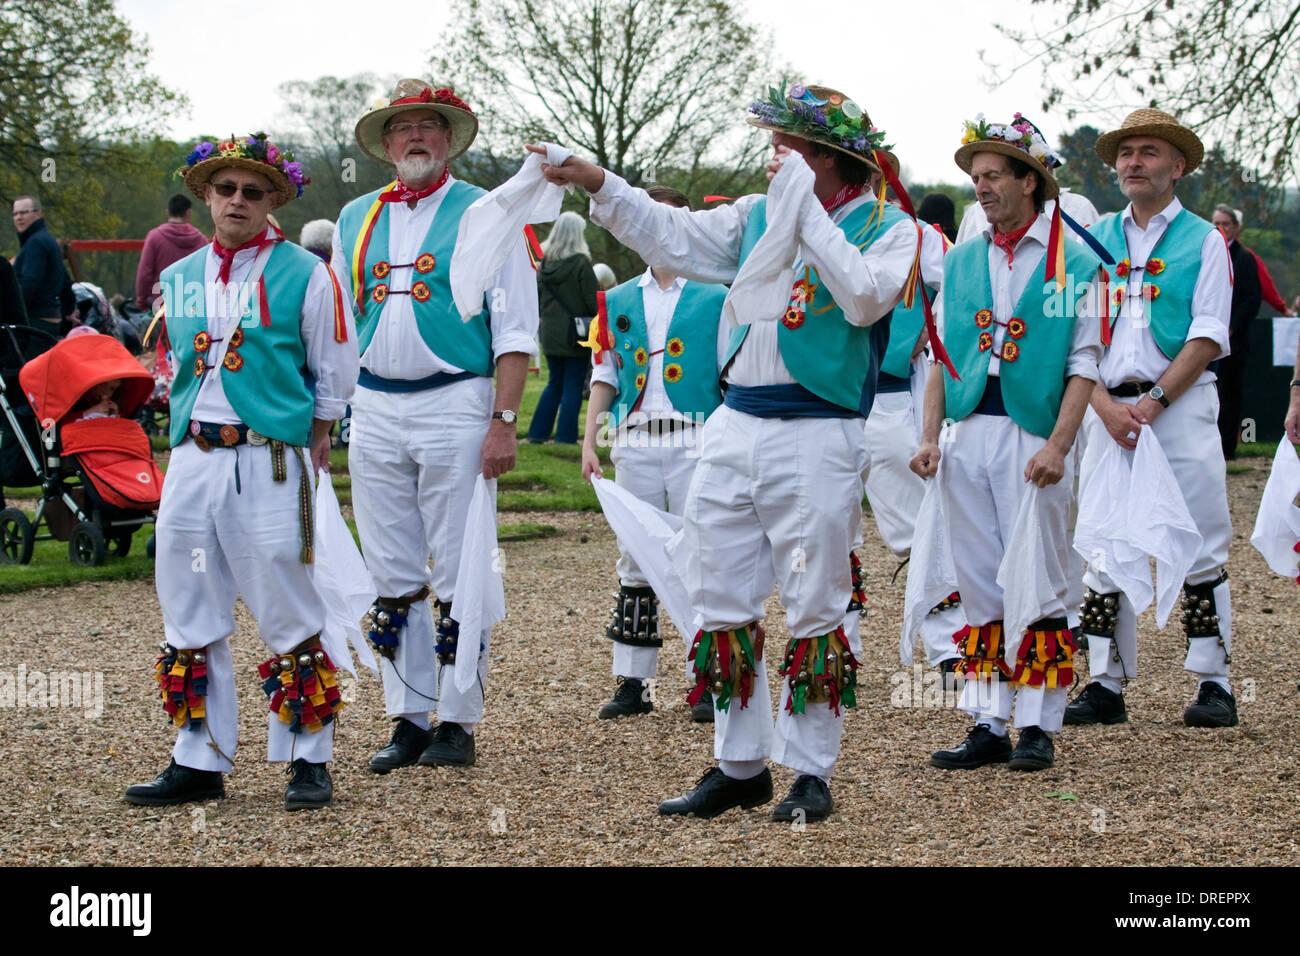 Morris dancing demonstration at Earsham Hall, Bungay - Stock Image